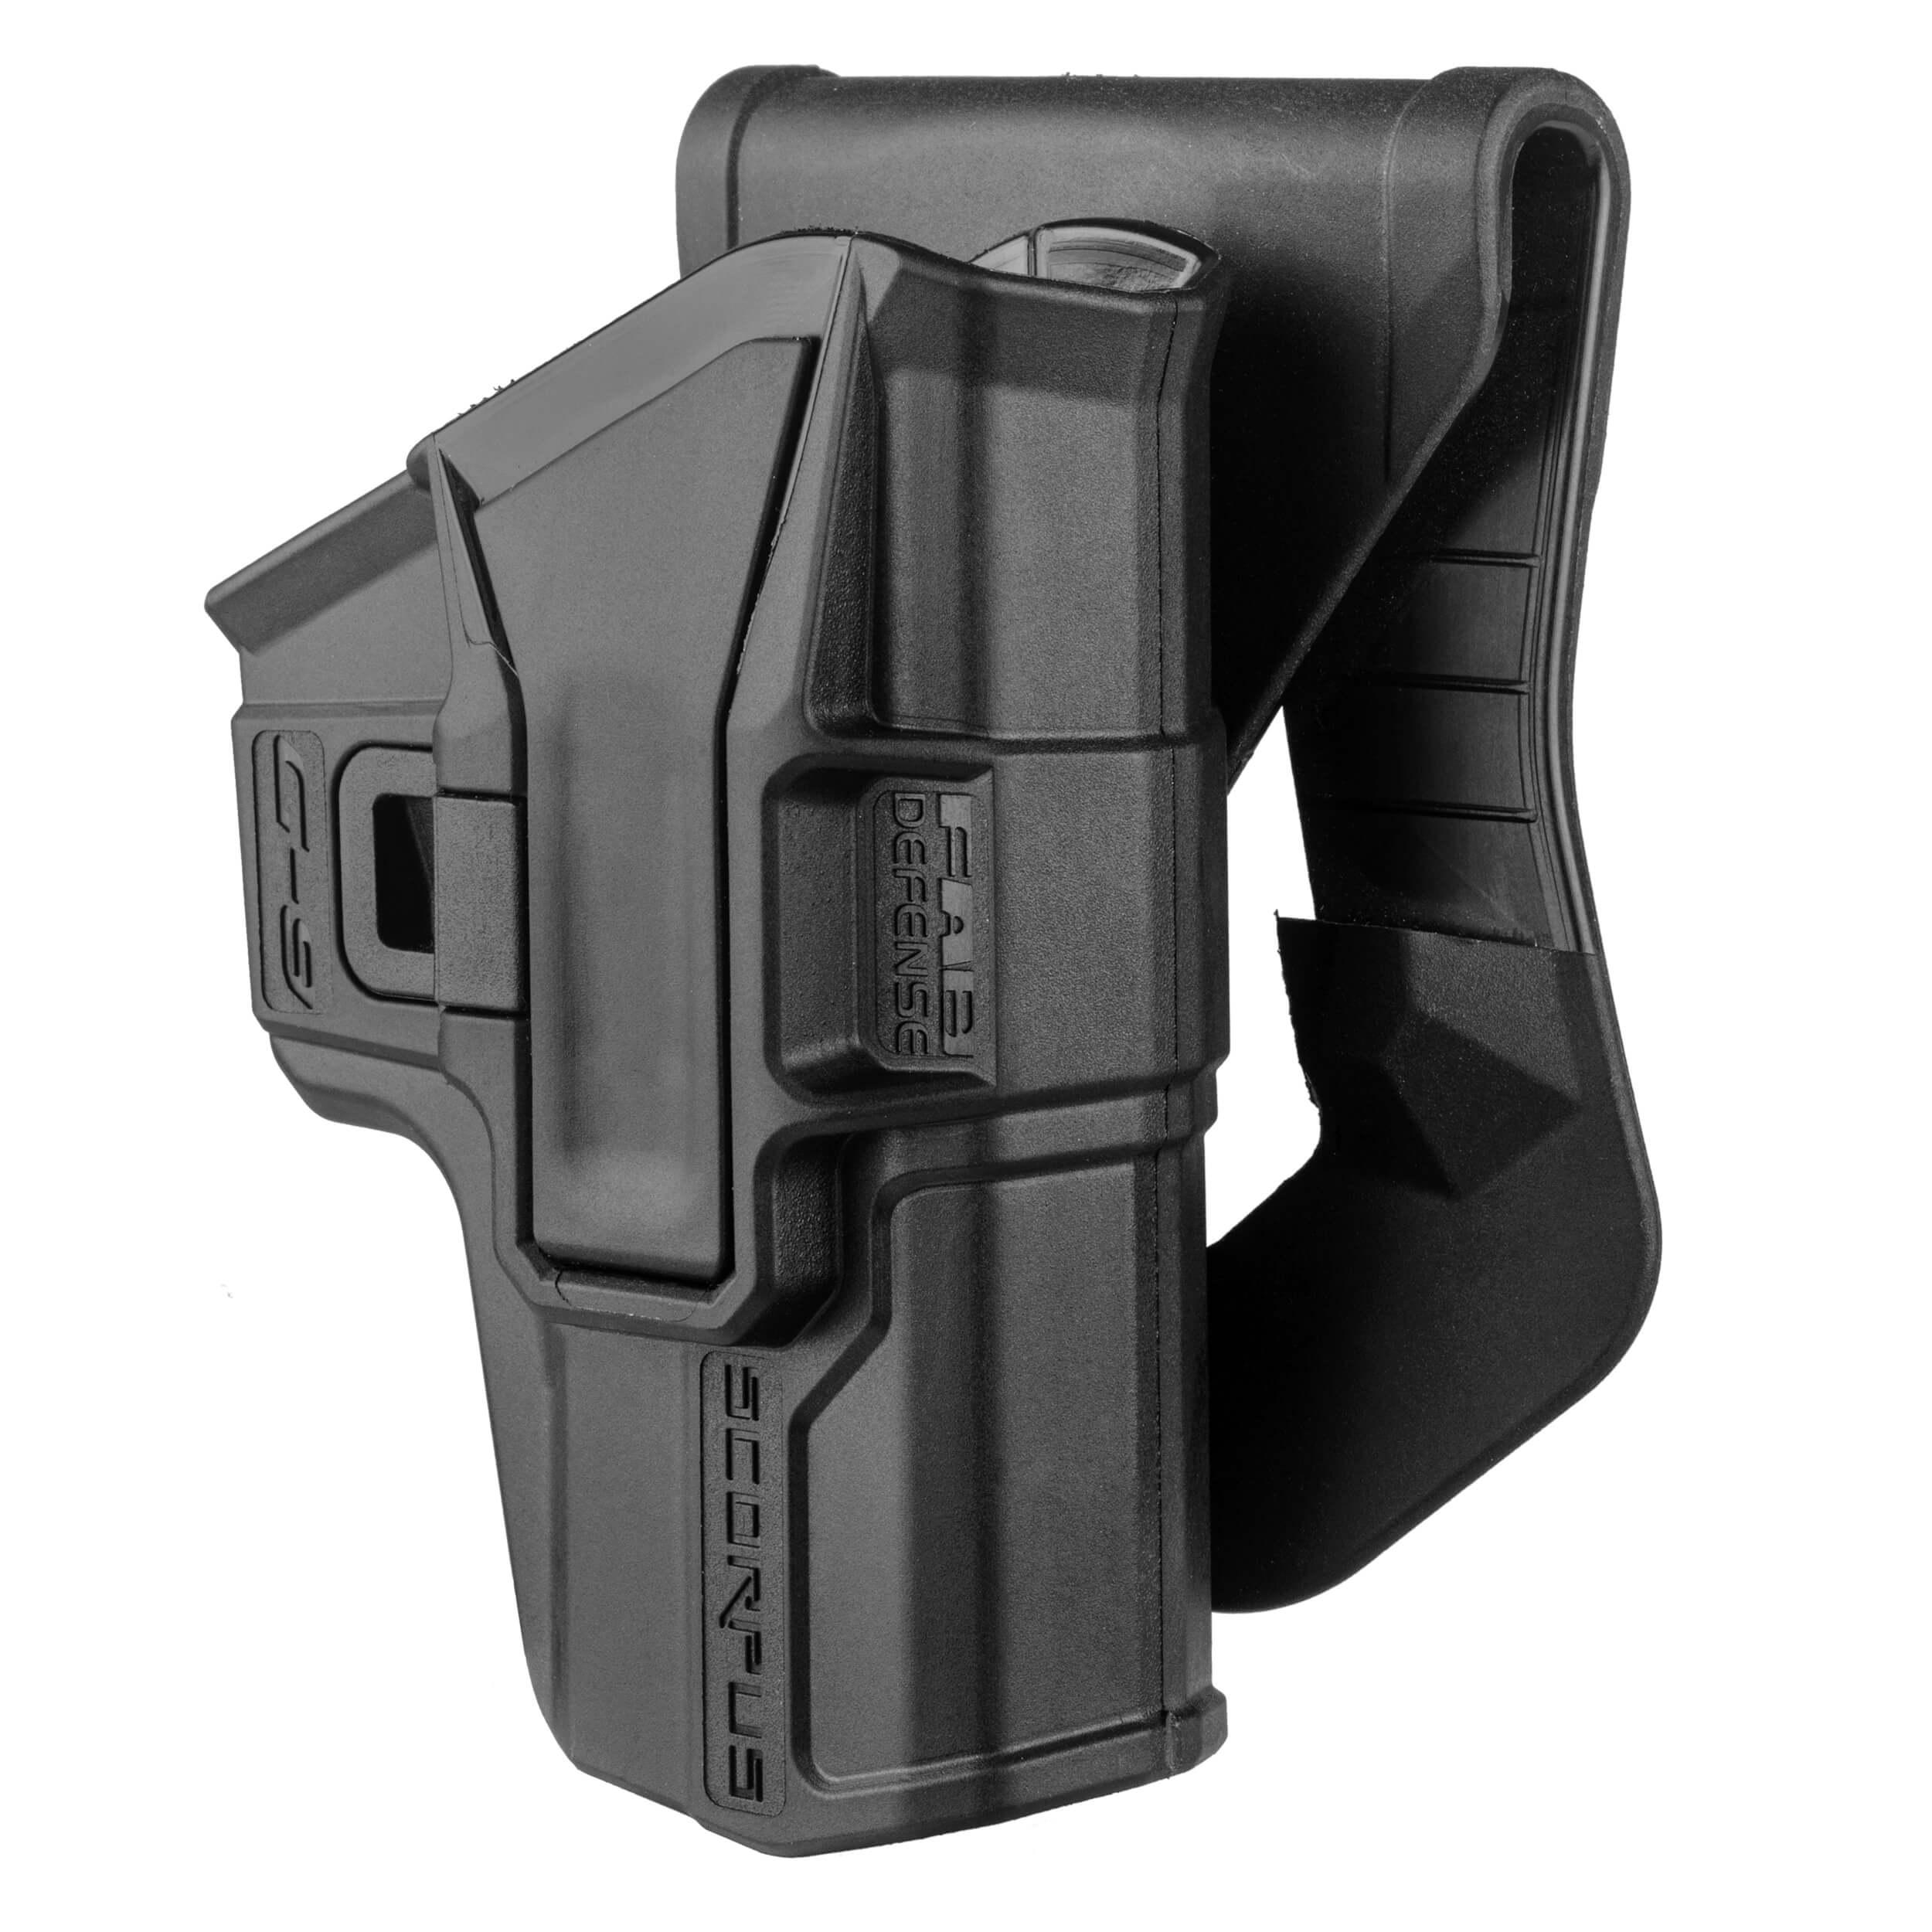 Glock Holster (LH) (Level 1)